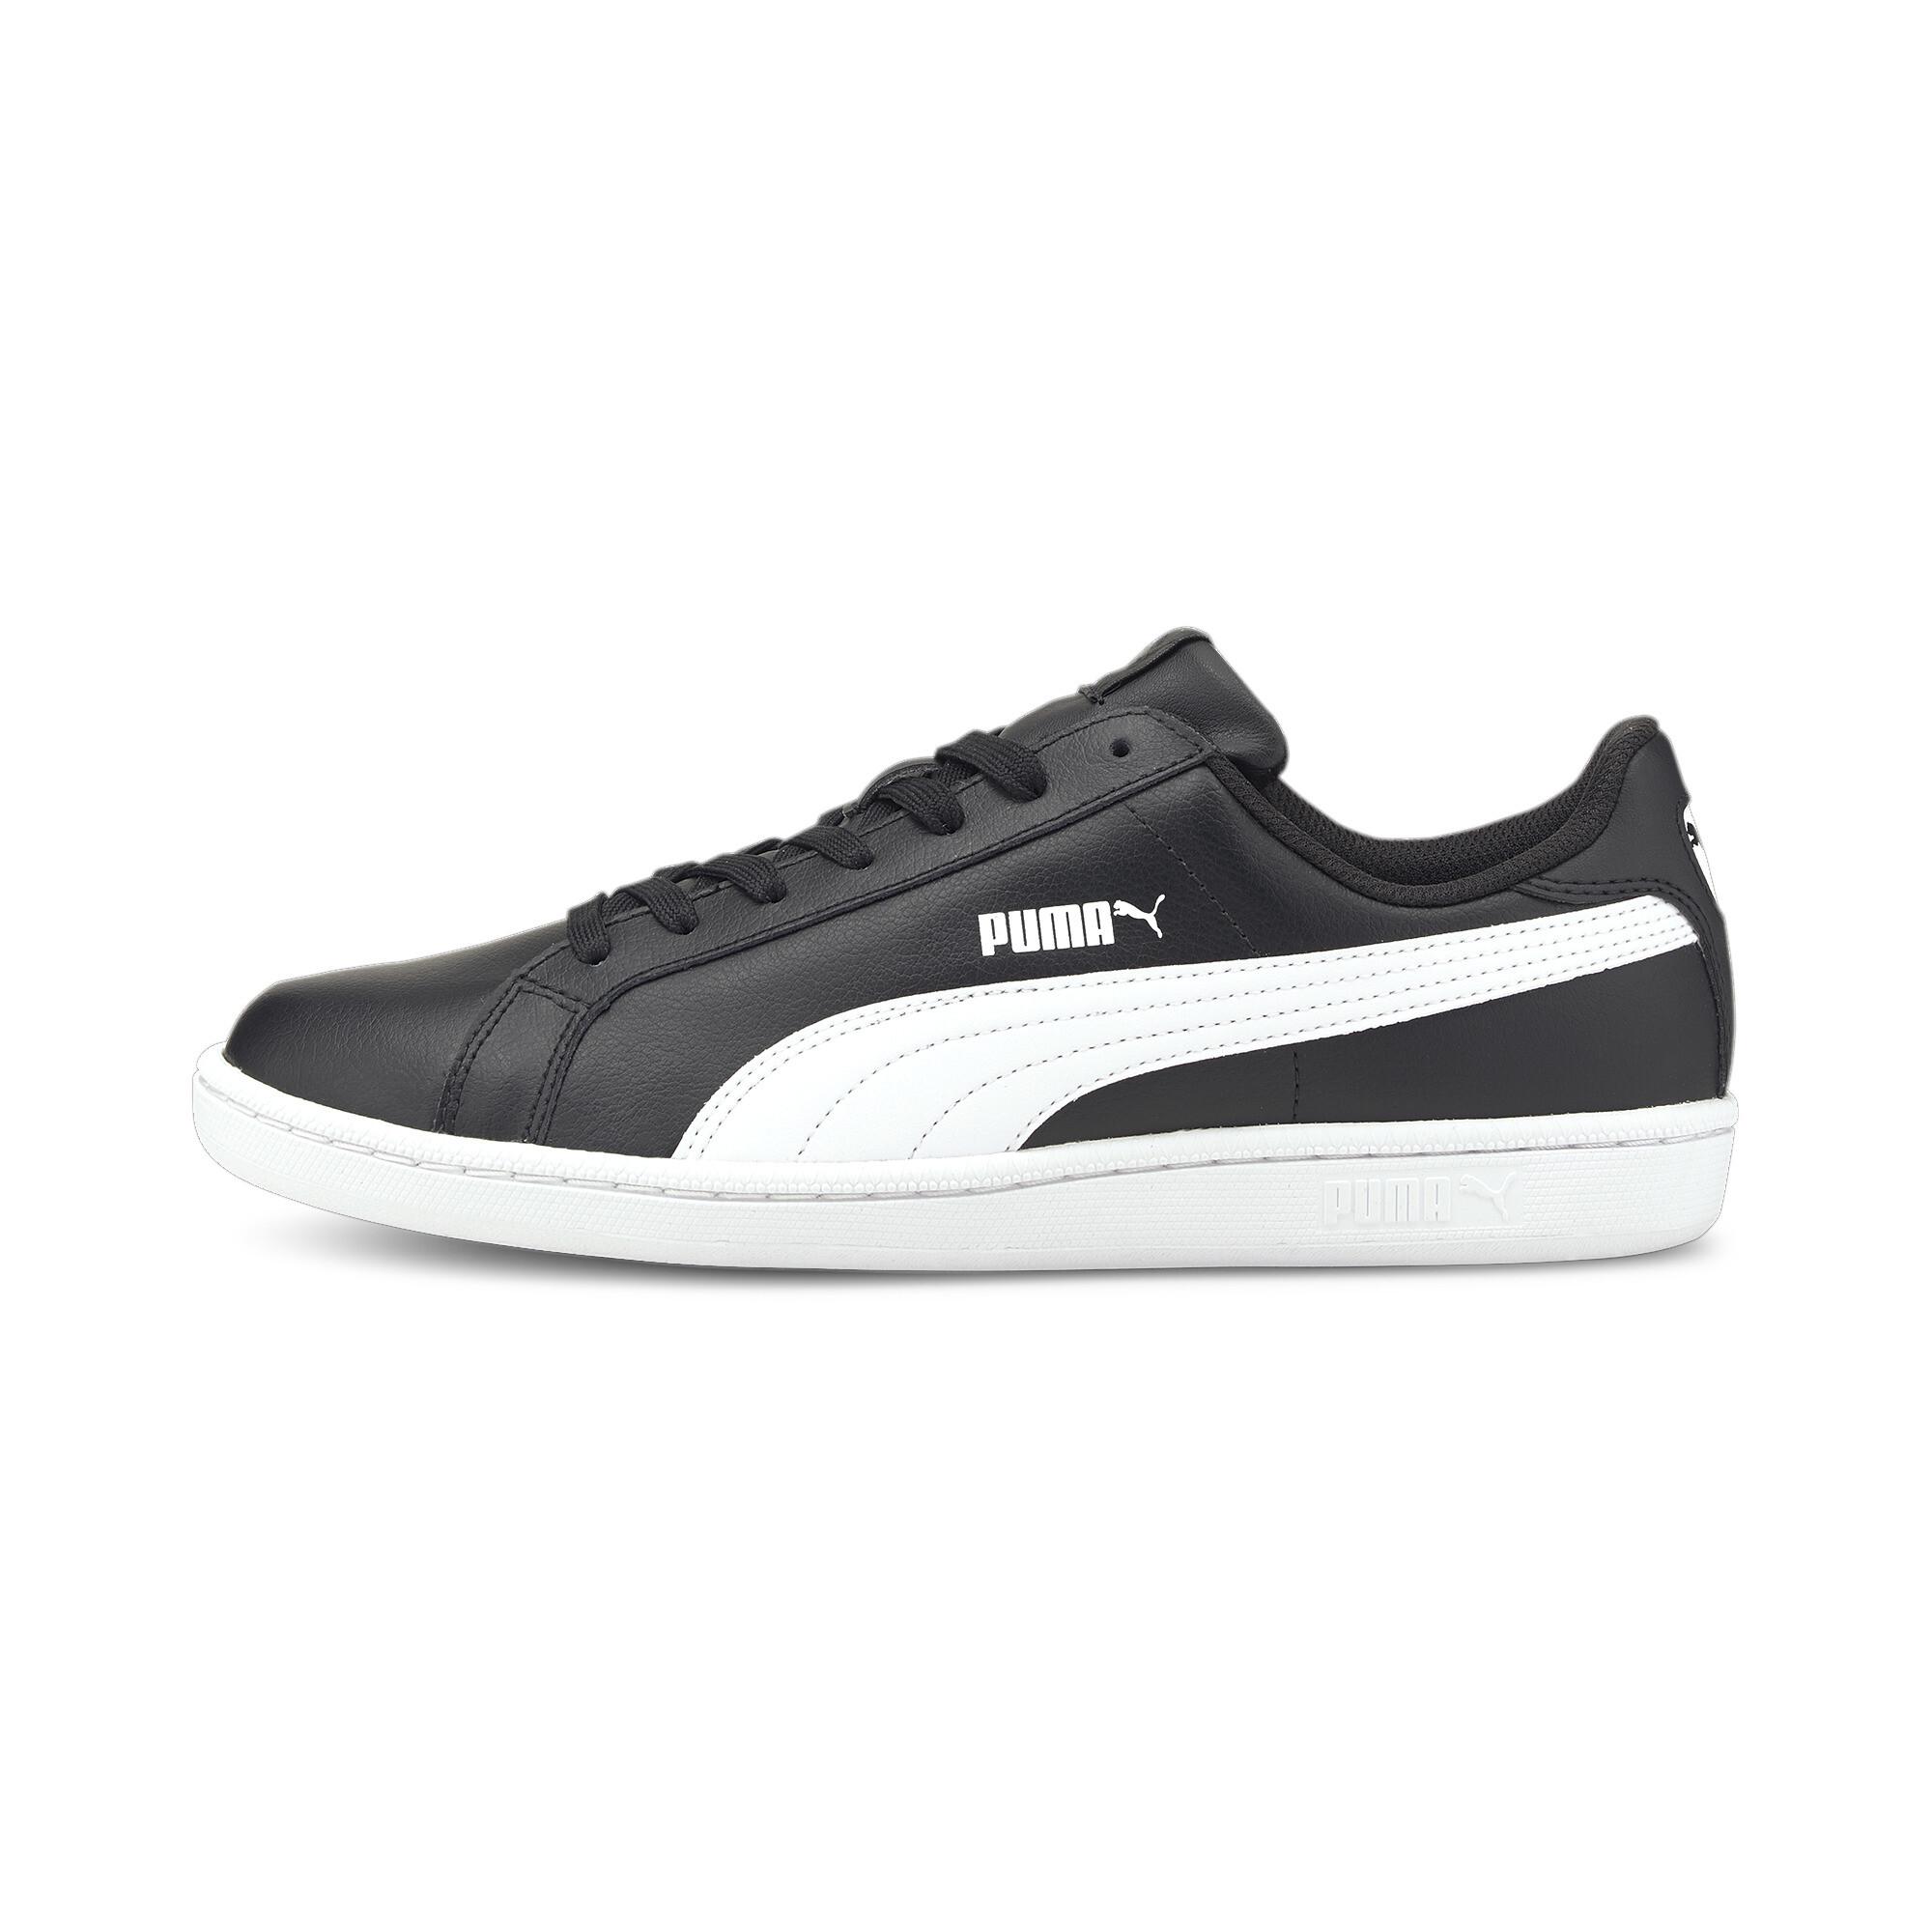 PUMA-Smash-Trainers-Schuhe-Sneakers-Sport-Classics-Unisex-Neu Indexbild 19